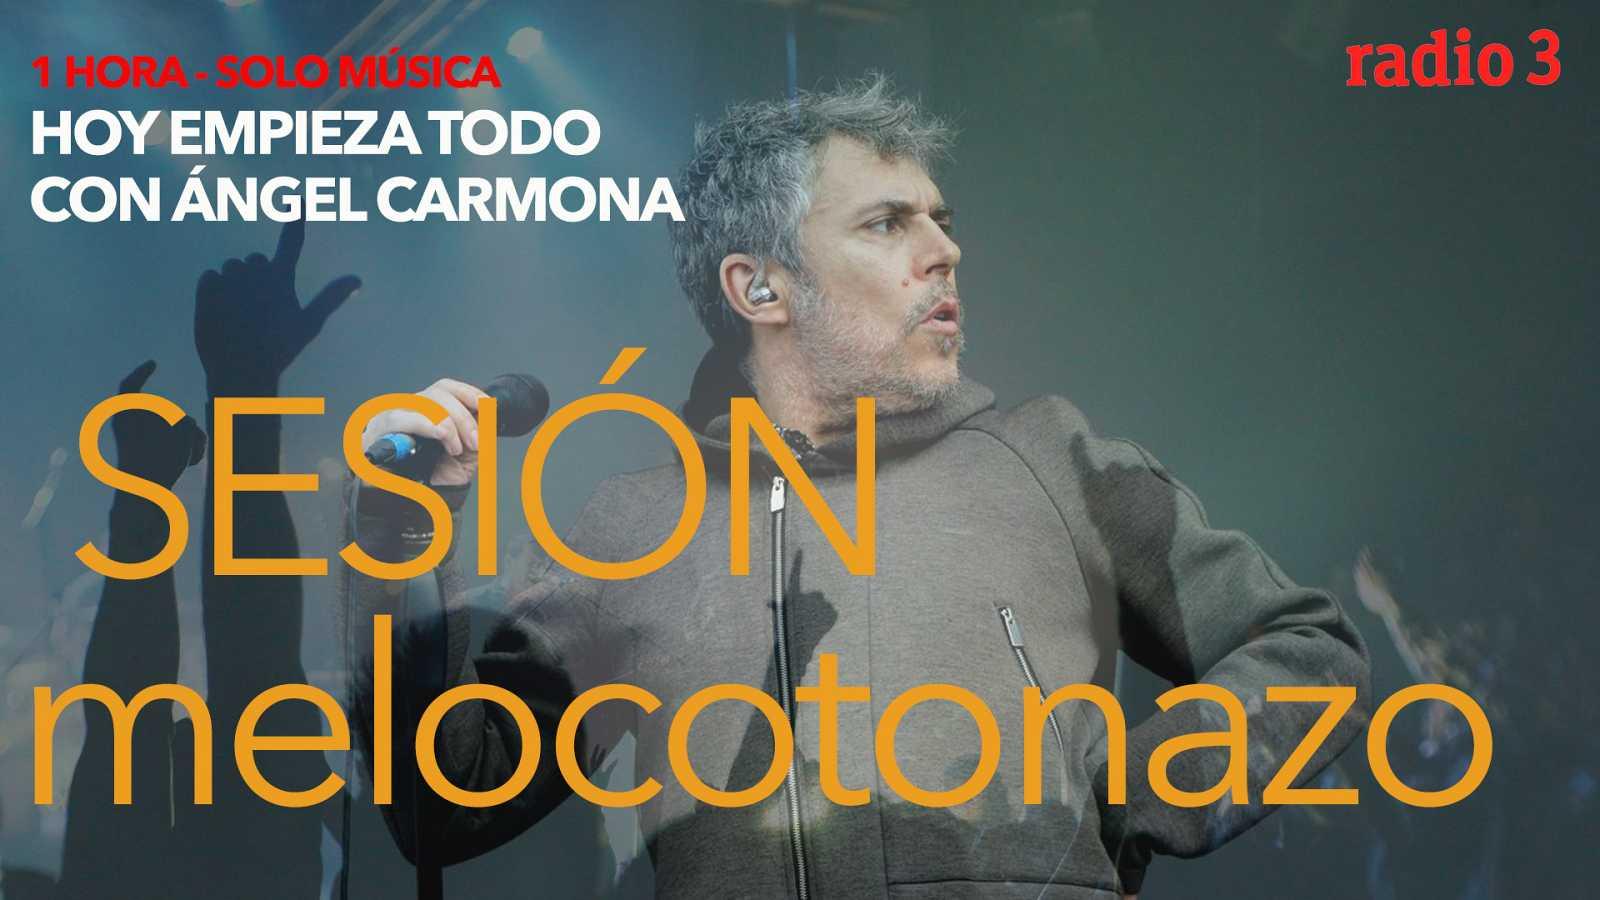 "Hoy empieza todo con Ángel Carmona - ""#SesiónMelocotonazo"": Haim, Iván Ferreiro, MGMT... - 16/02/21 - escuchar ahora"